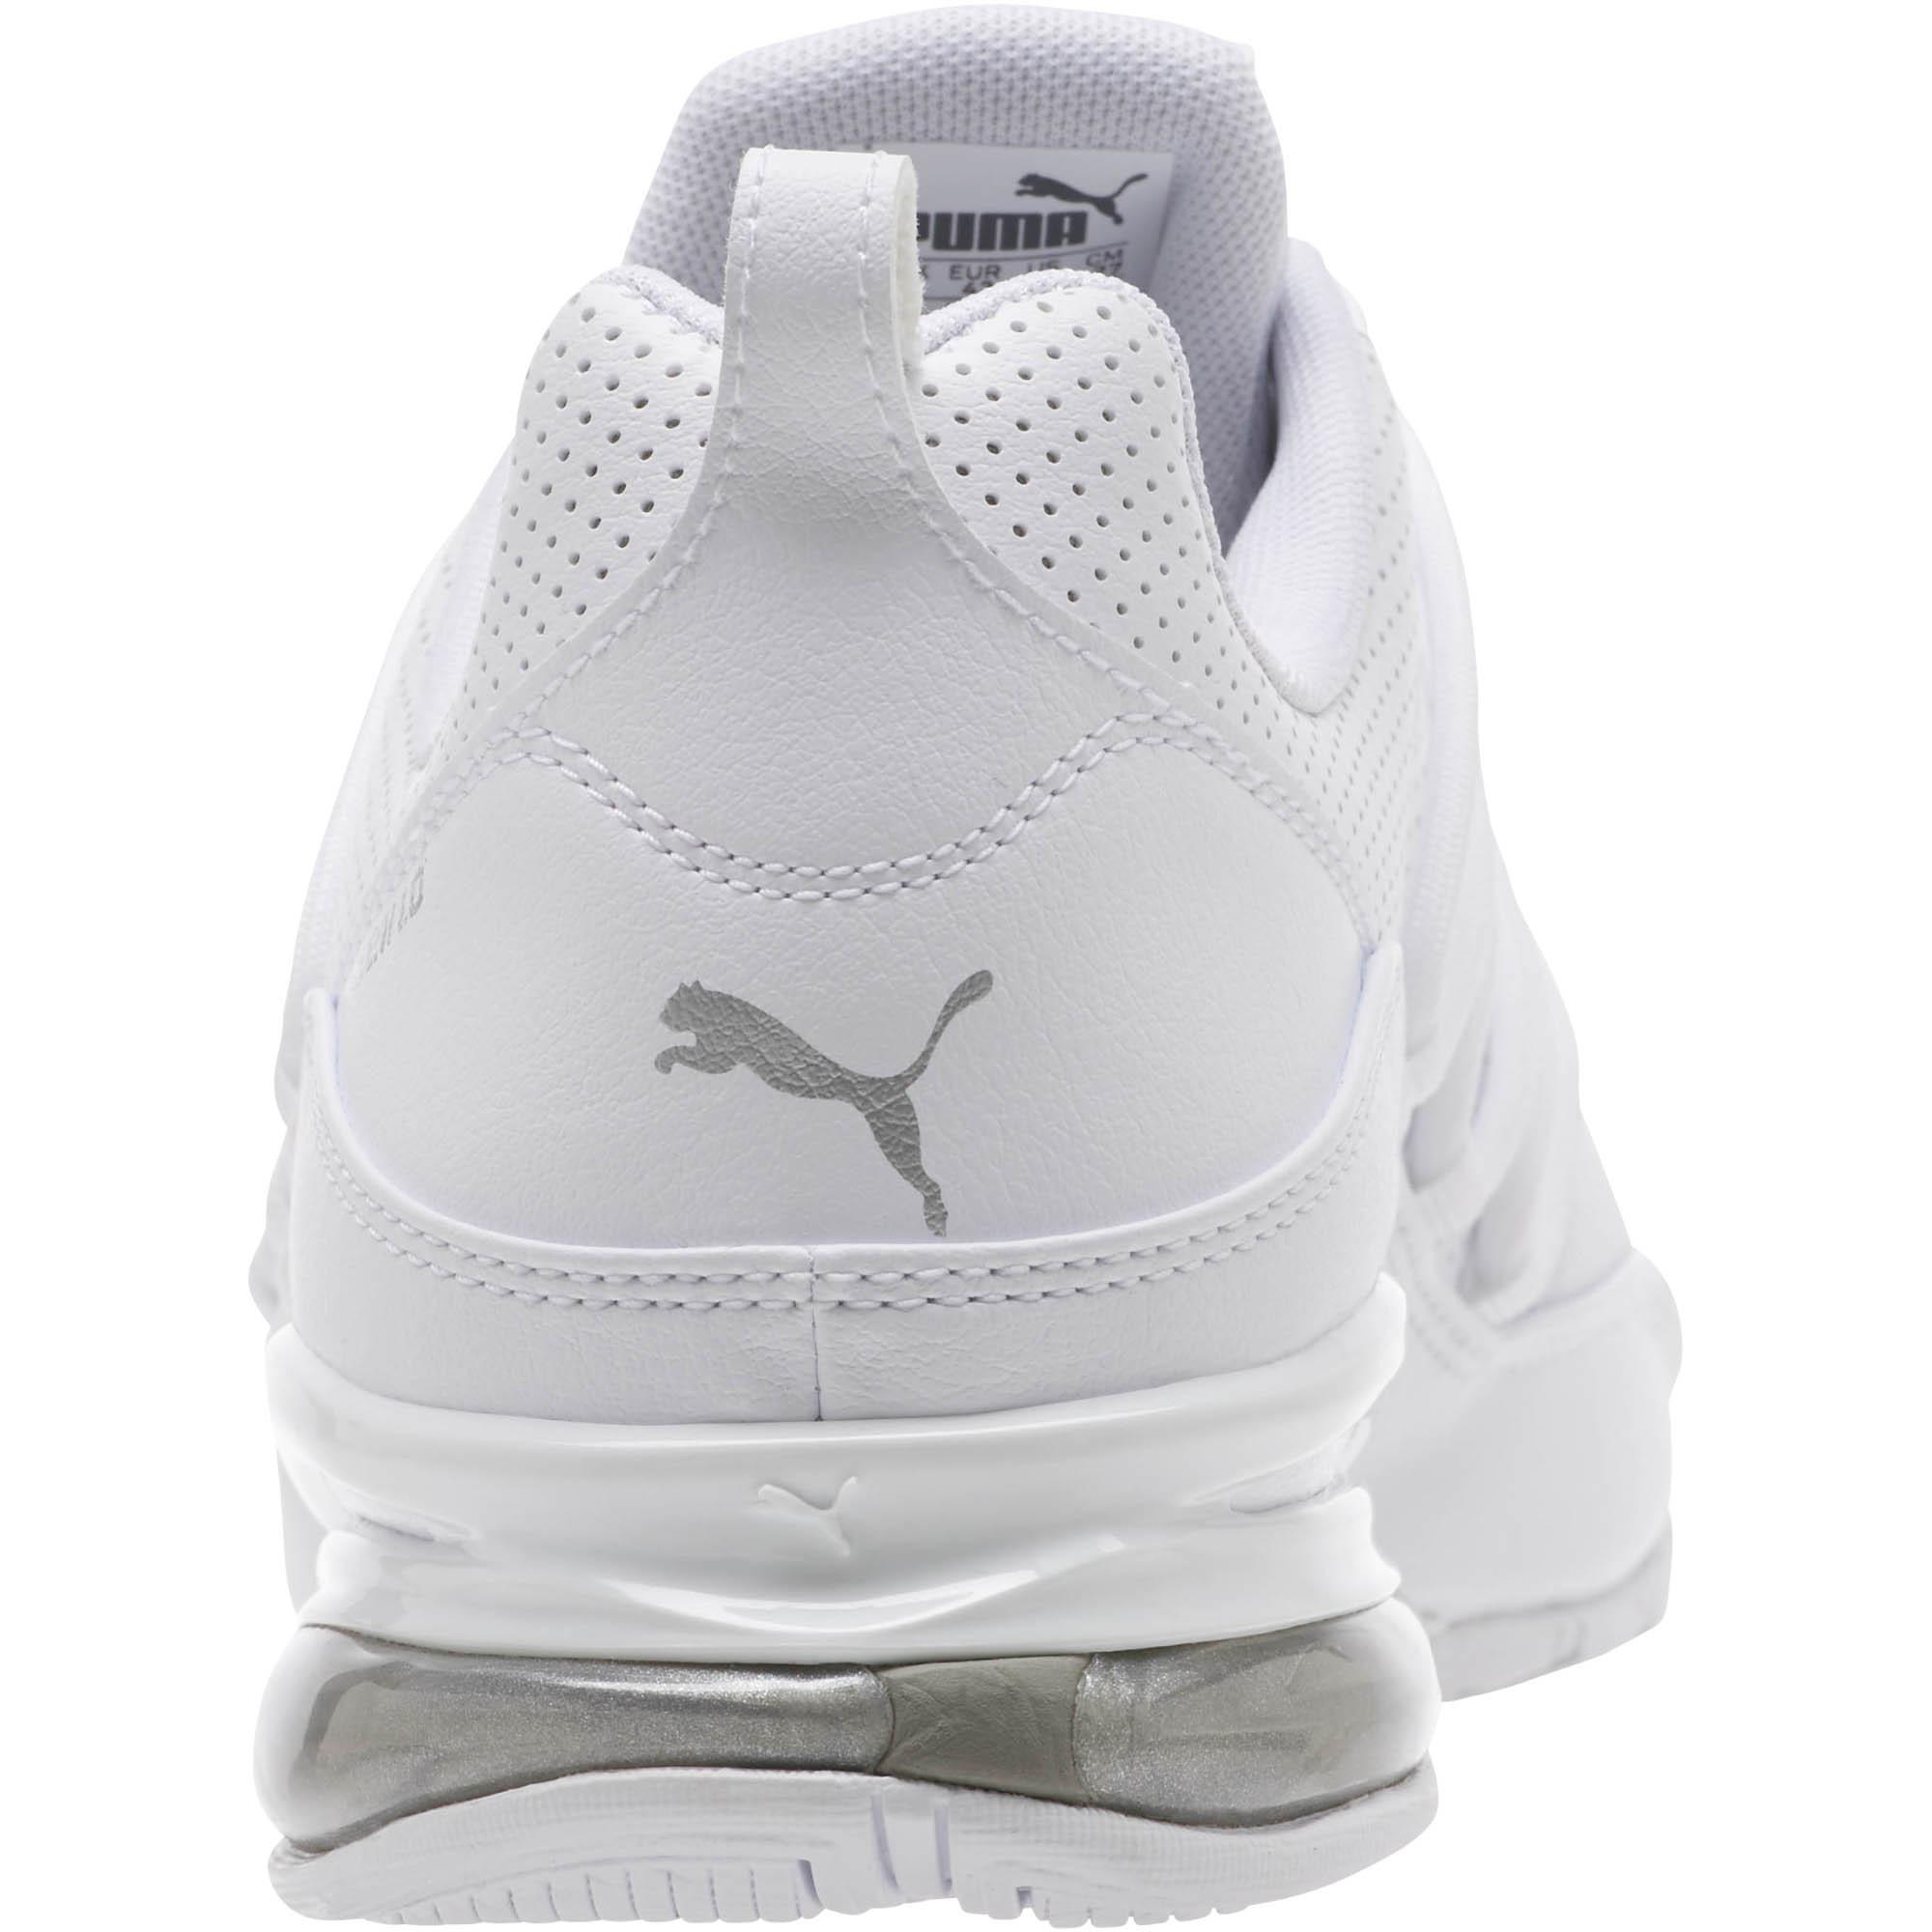 PUMA - White Cell Pro Limit Men s Running Shoes for Men - Lyst. View  fullscreen e34f33d98